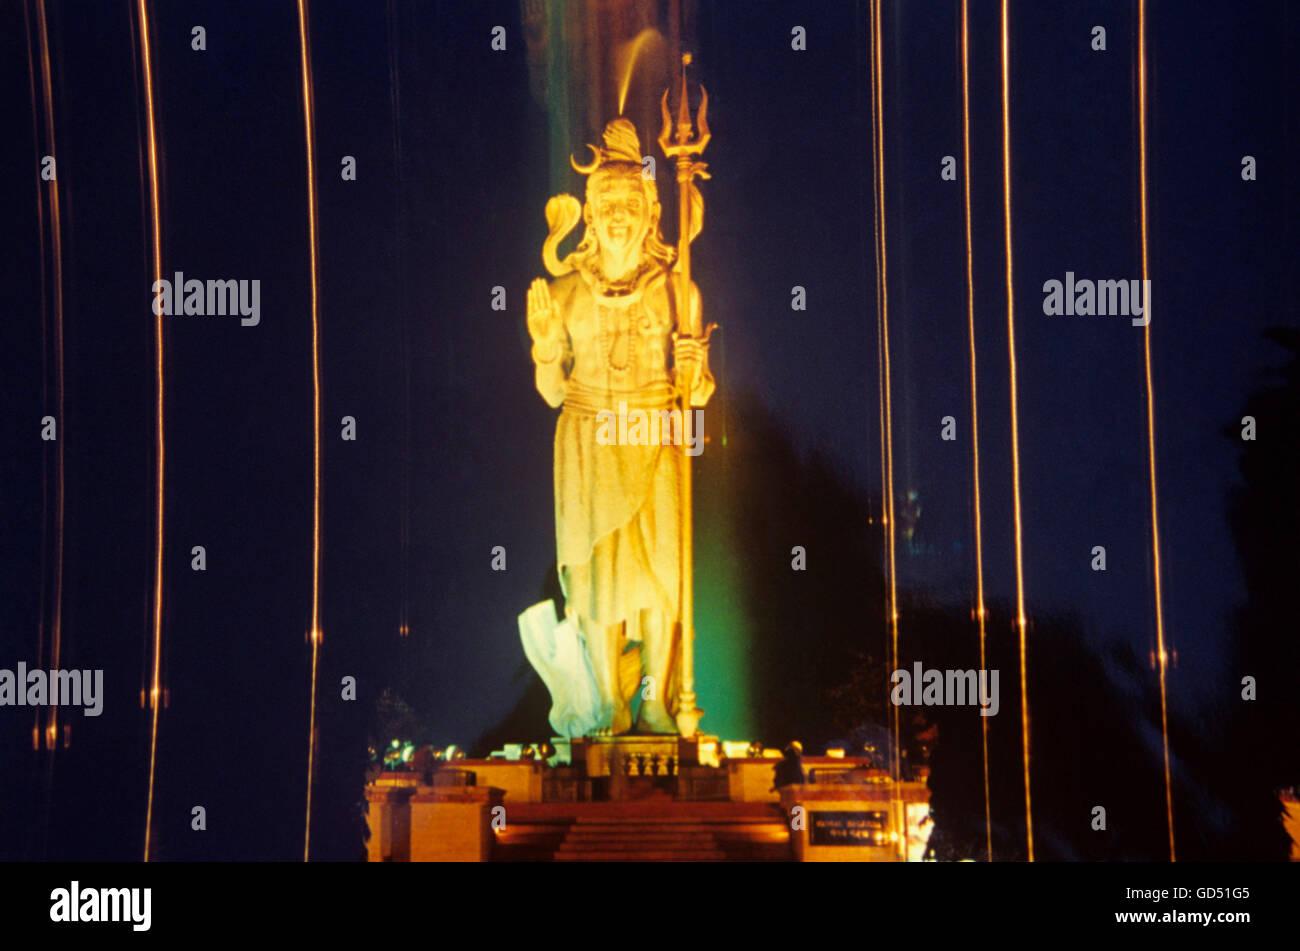 Idol of lord Shiva - Stock Image